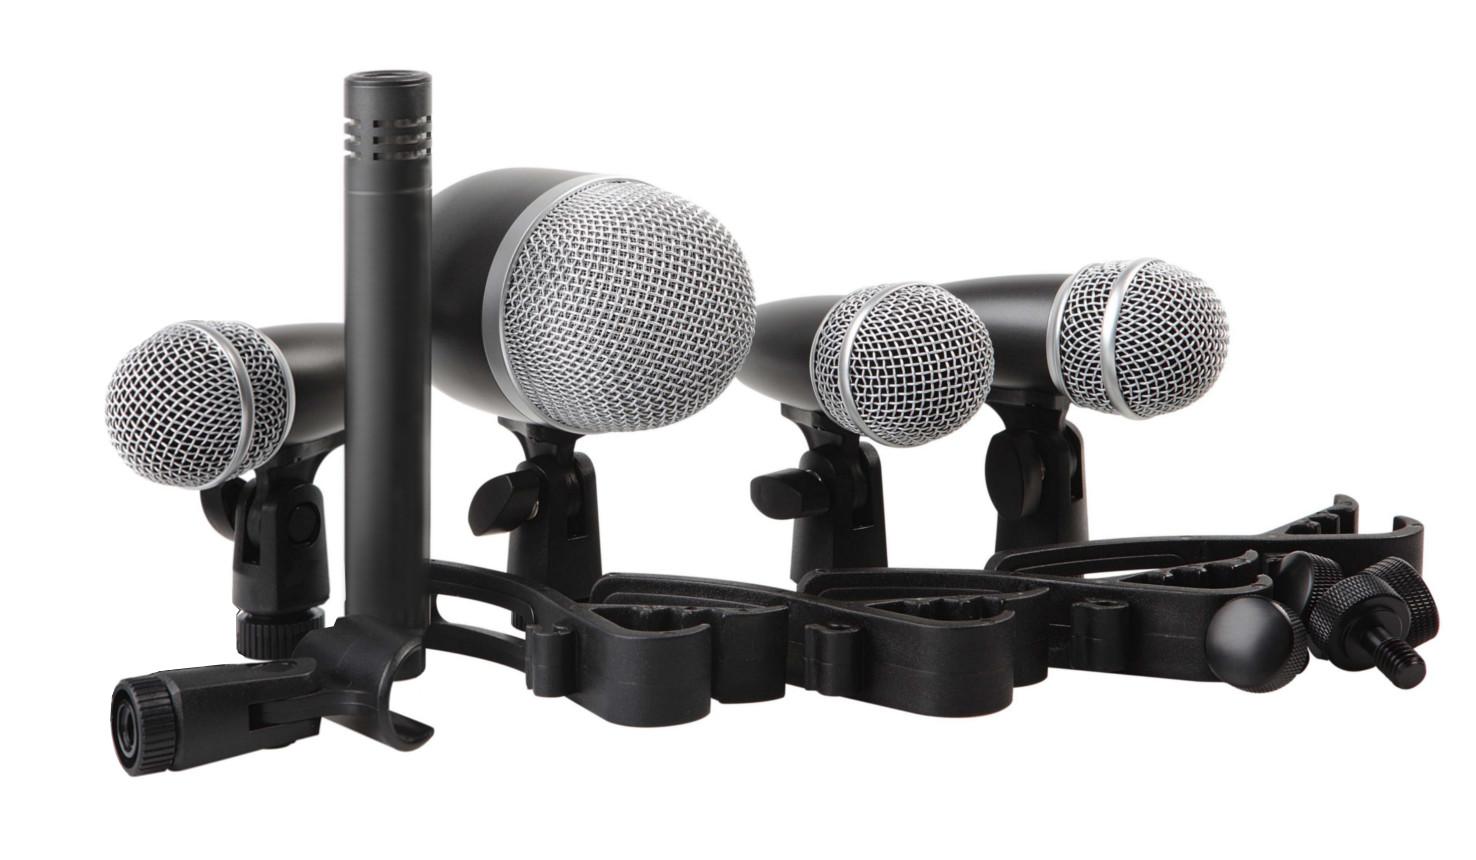 PROEL DMH5XL - Set di 5 microfoni per batteria - Voce - Audio Microfoni - Microfoni Live